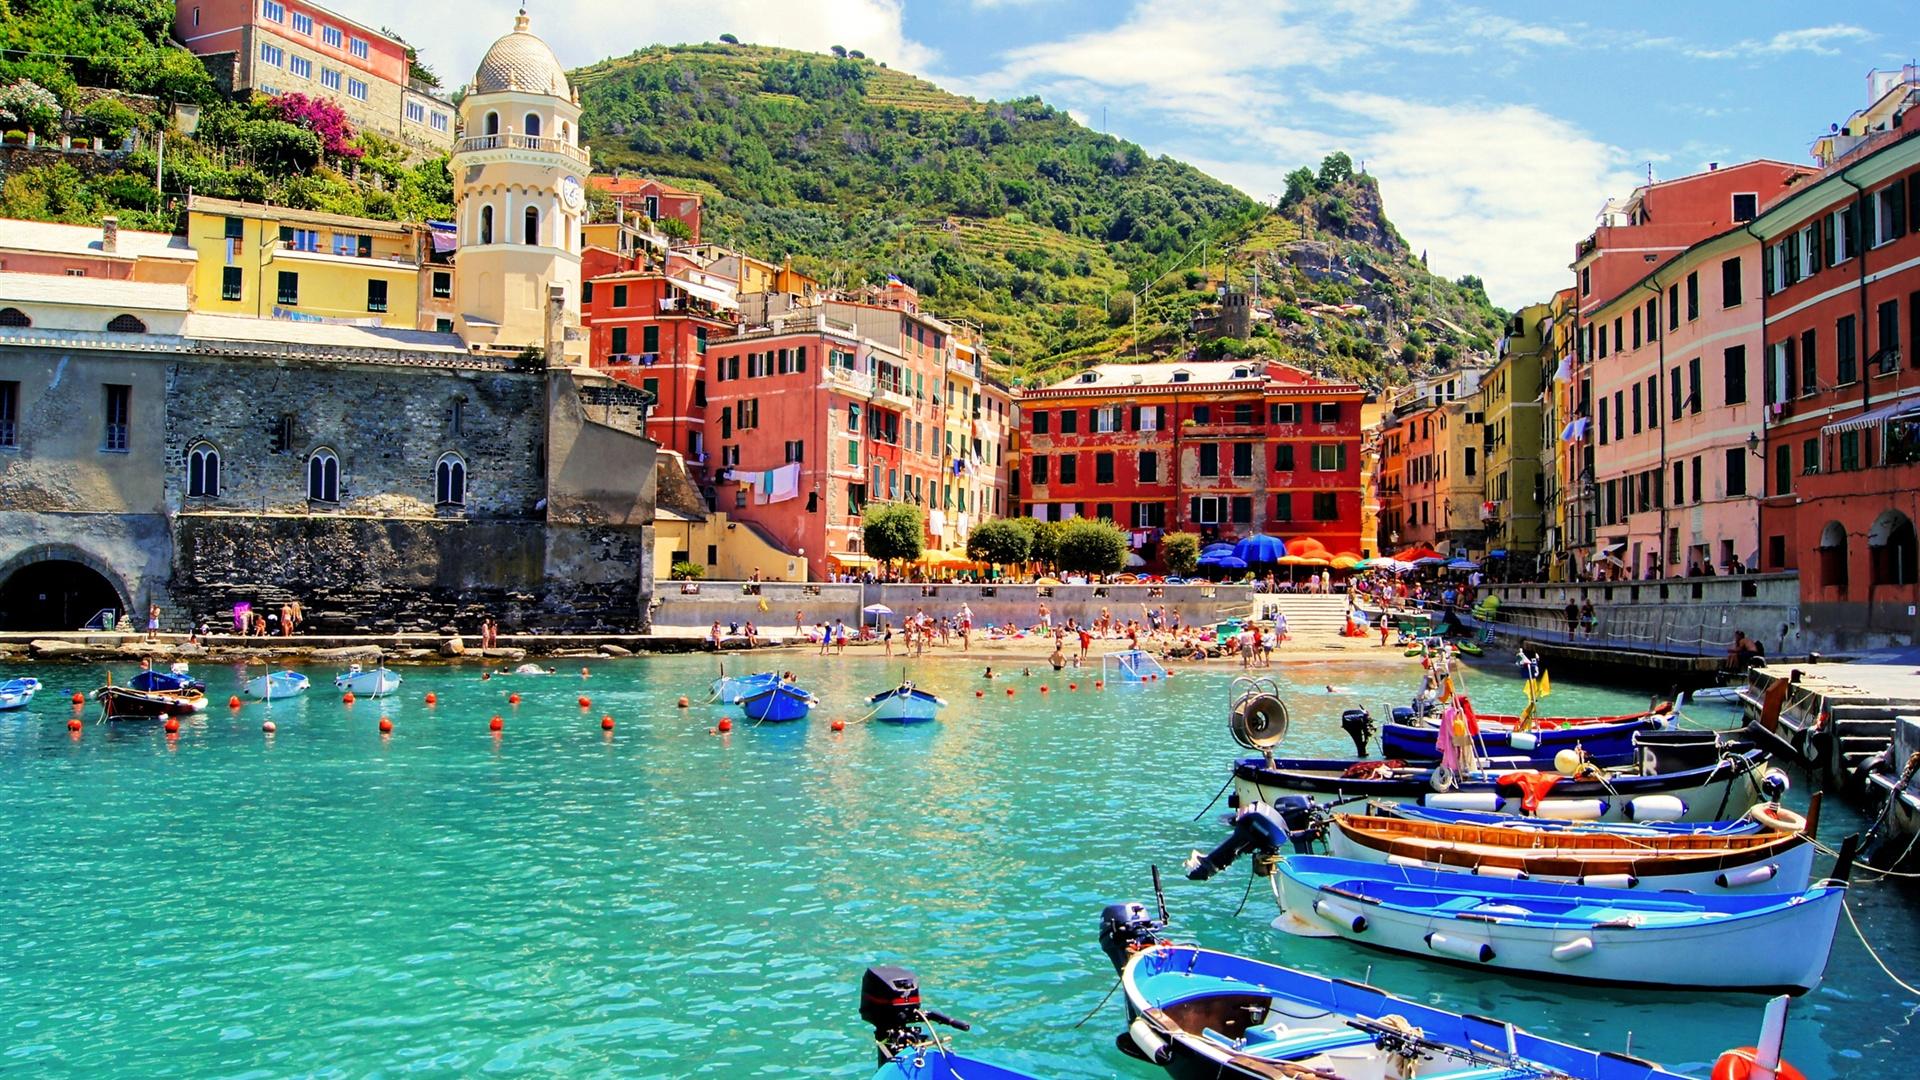 sea monterosso italy - photo #34